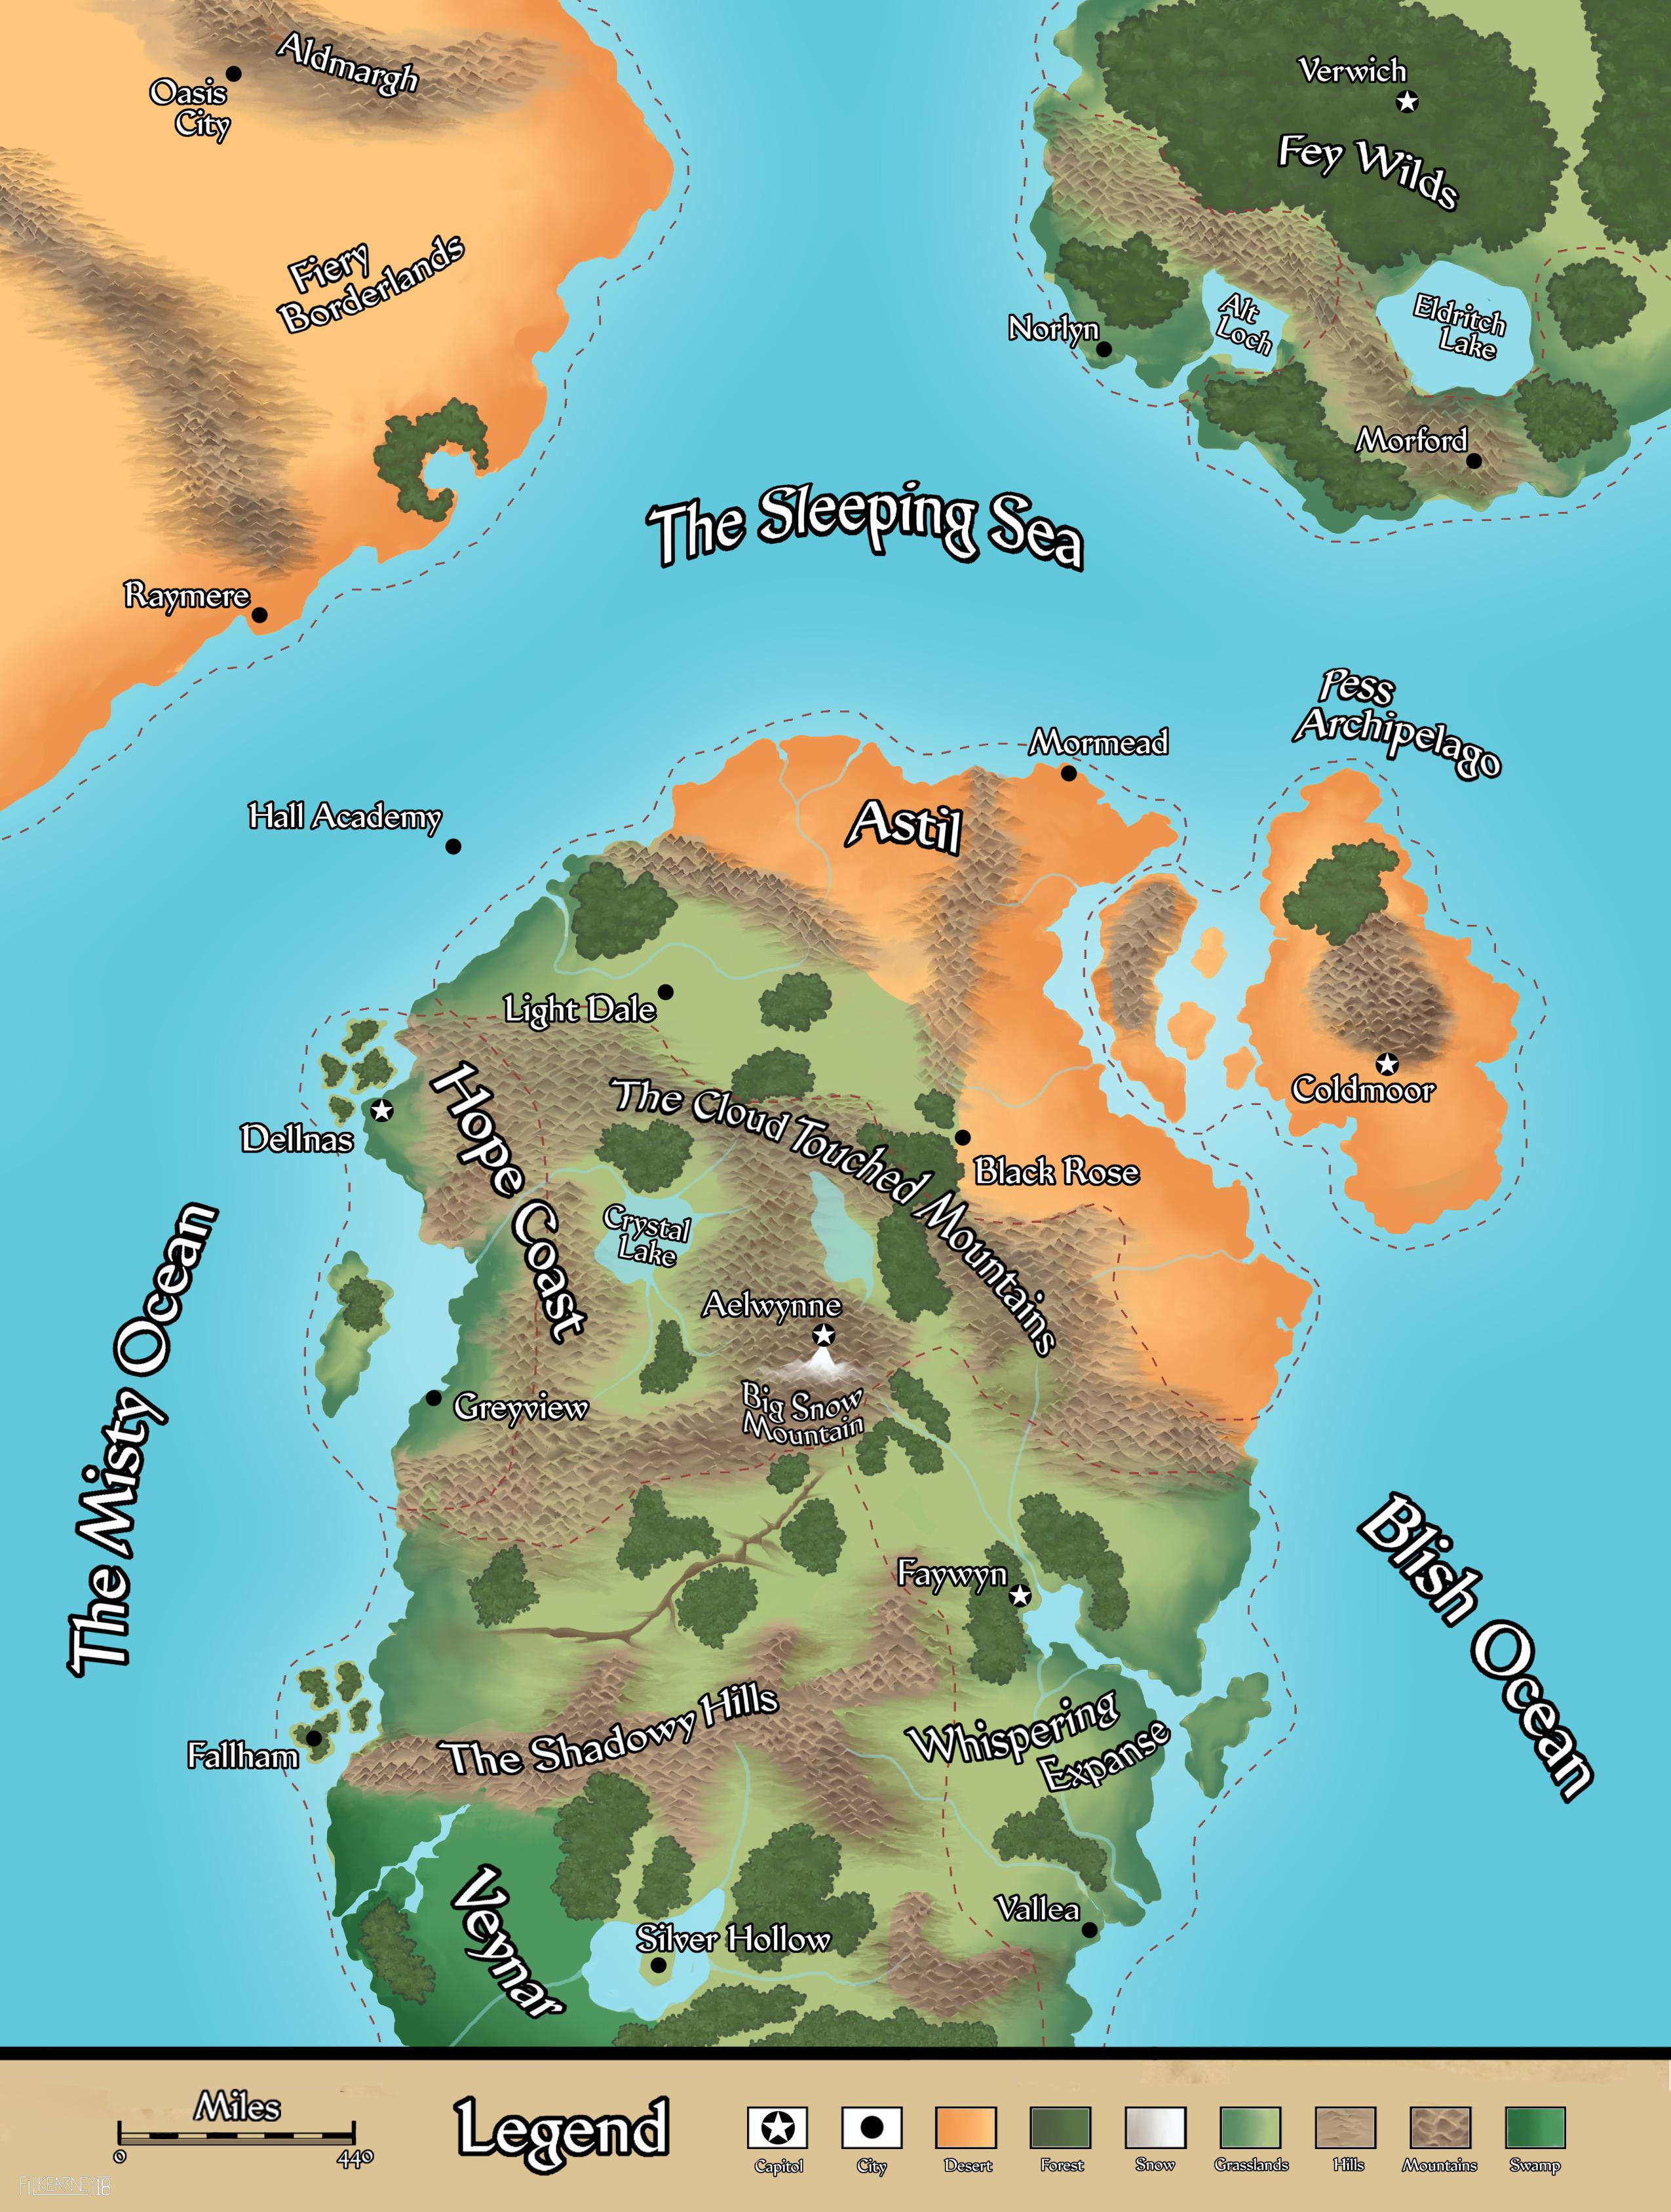 Pathfinder Map Format by FilKearney